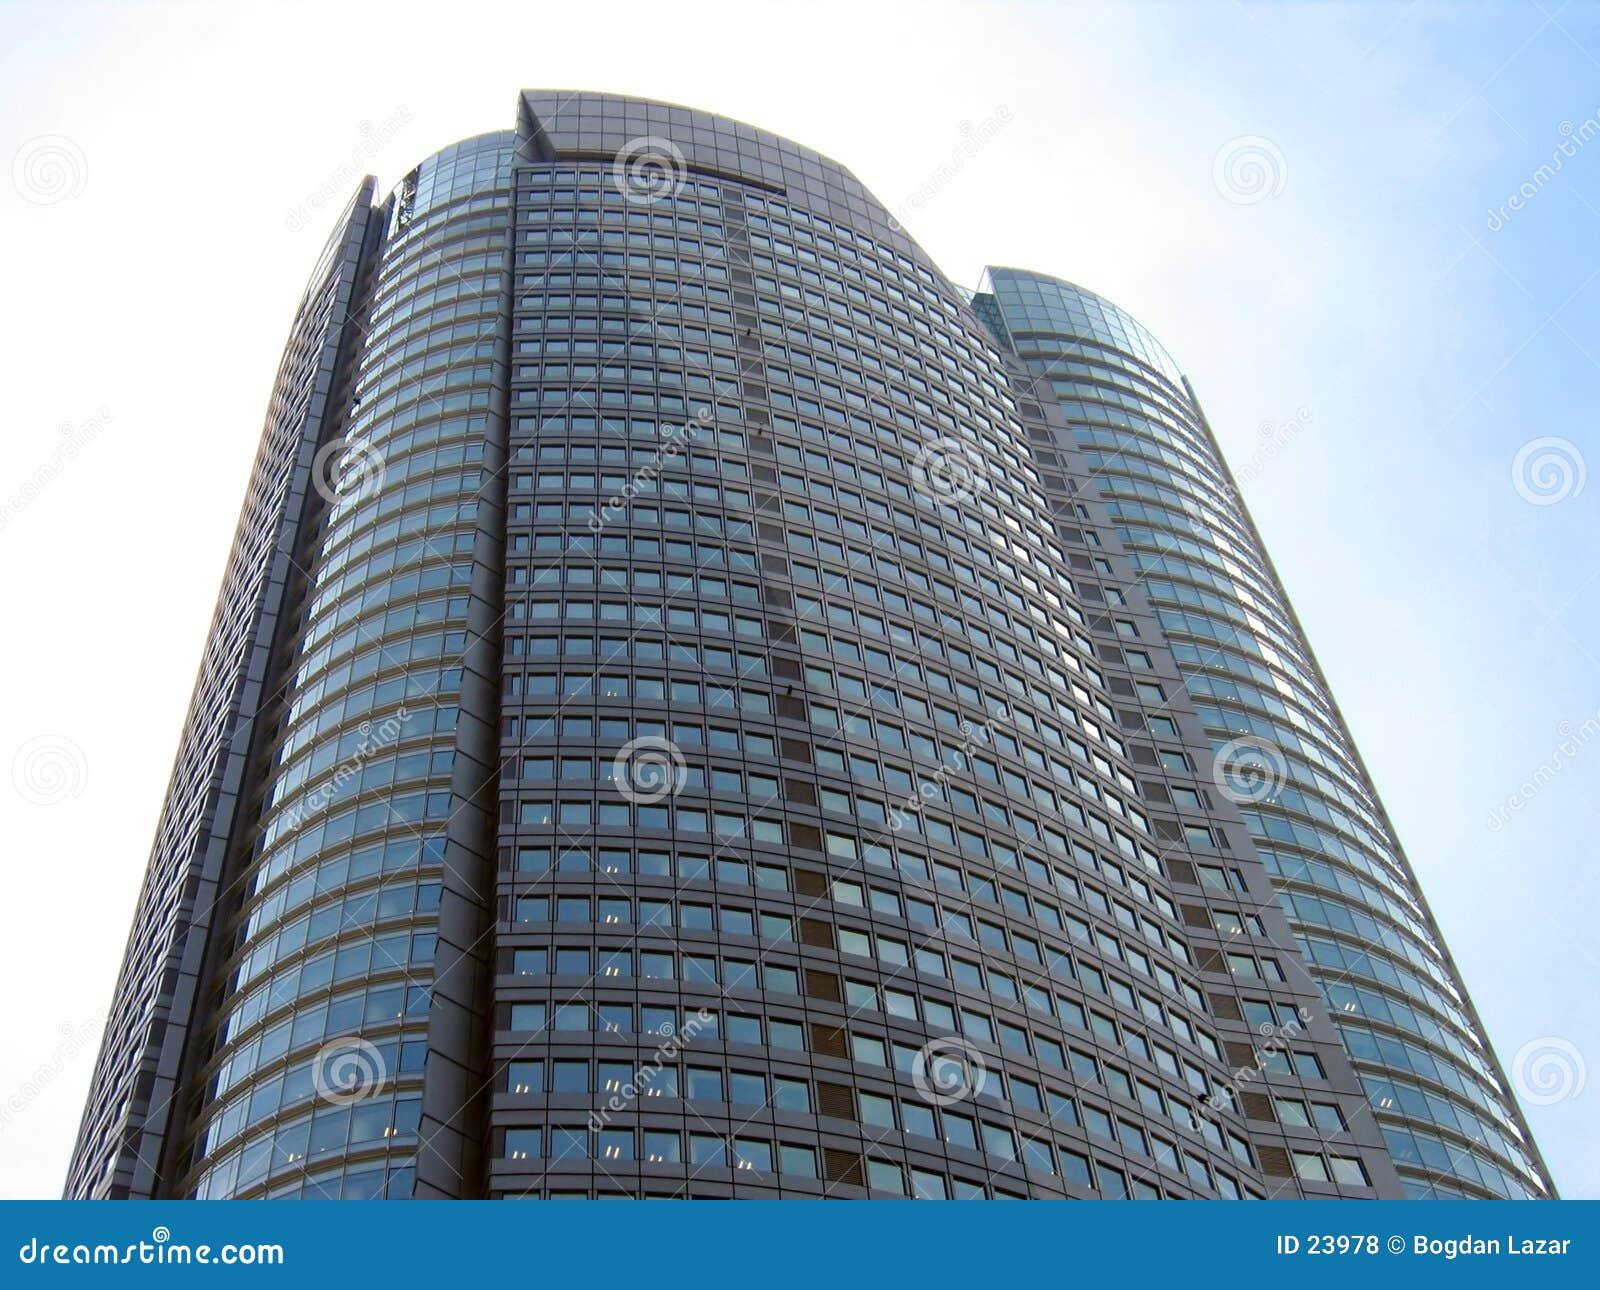 Skycraper - Roppongi Hills Main Tower